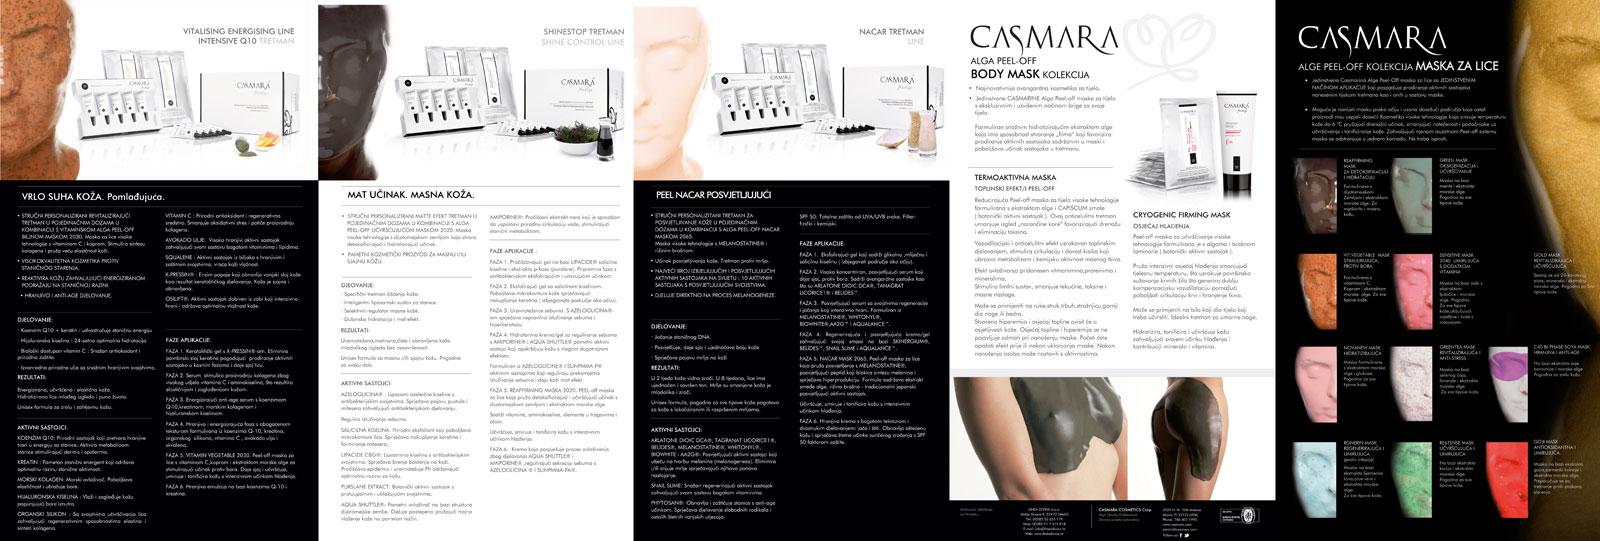 Casmara-brochure2